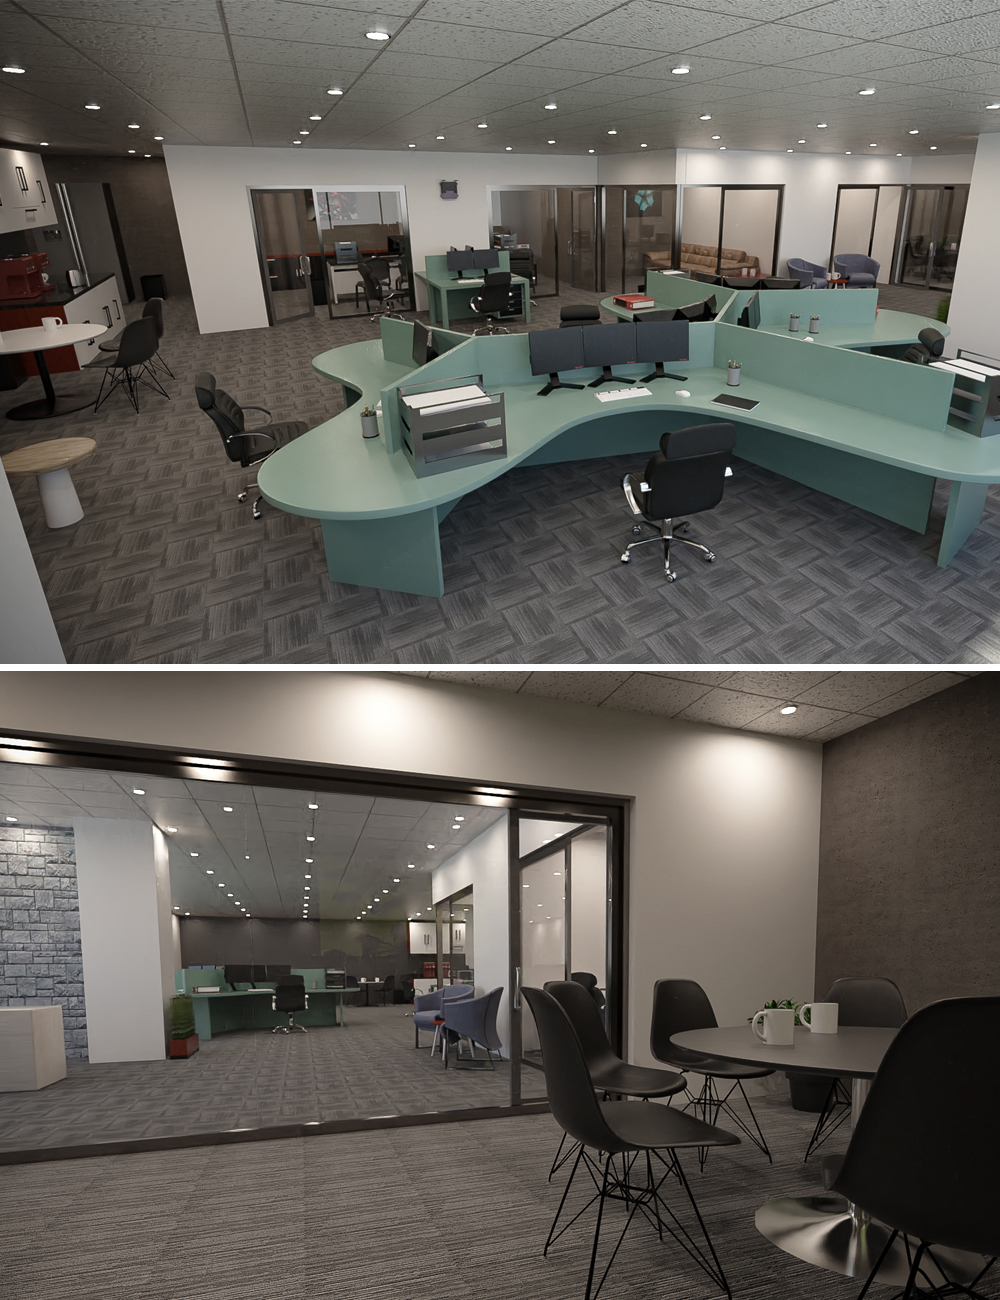 Designer Studio Office by: Tesla3dCorp, 3D Models by Daz 3D